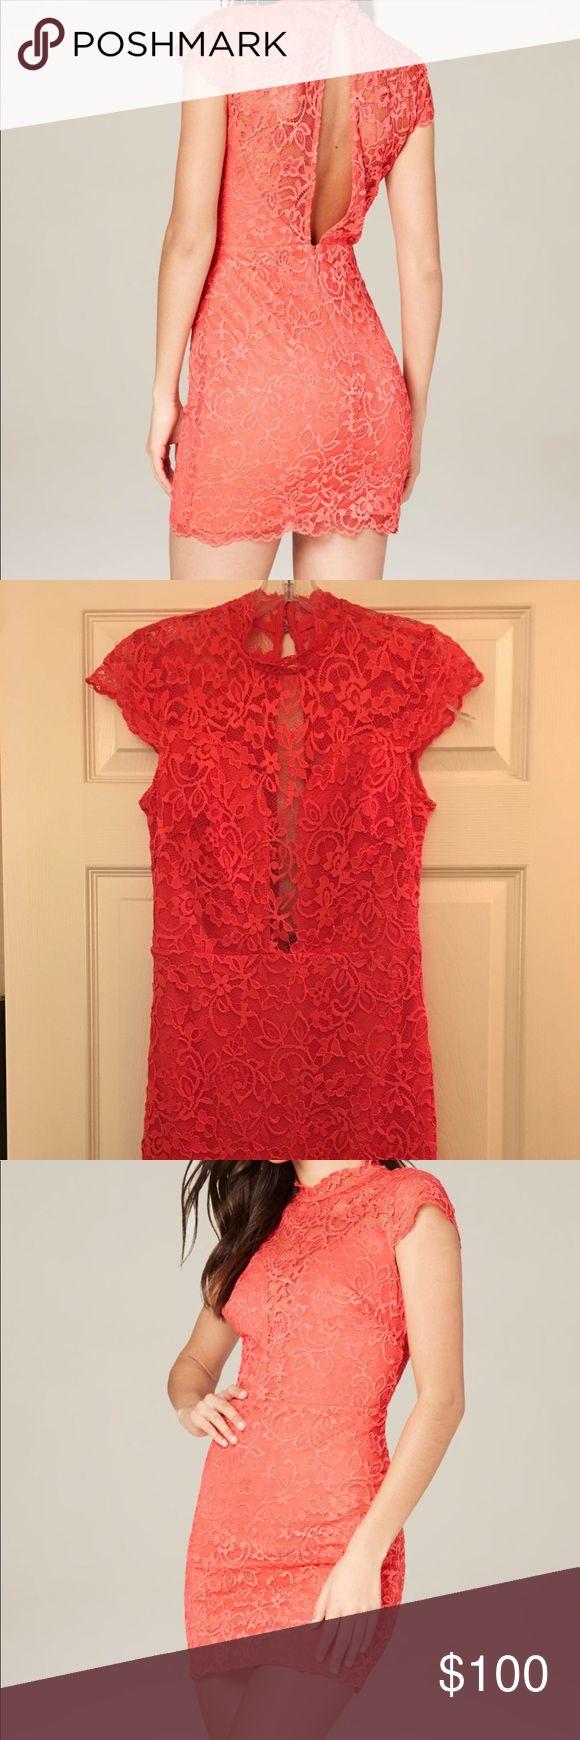 BEBE GWEN LACE MOCK NECK DRESS New coral lace dress bebe Dresses Mini